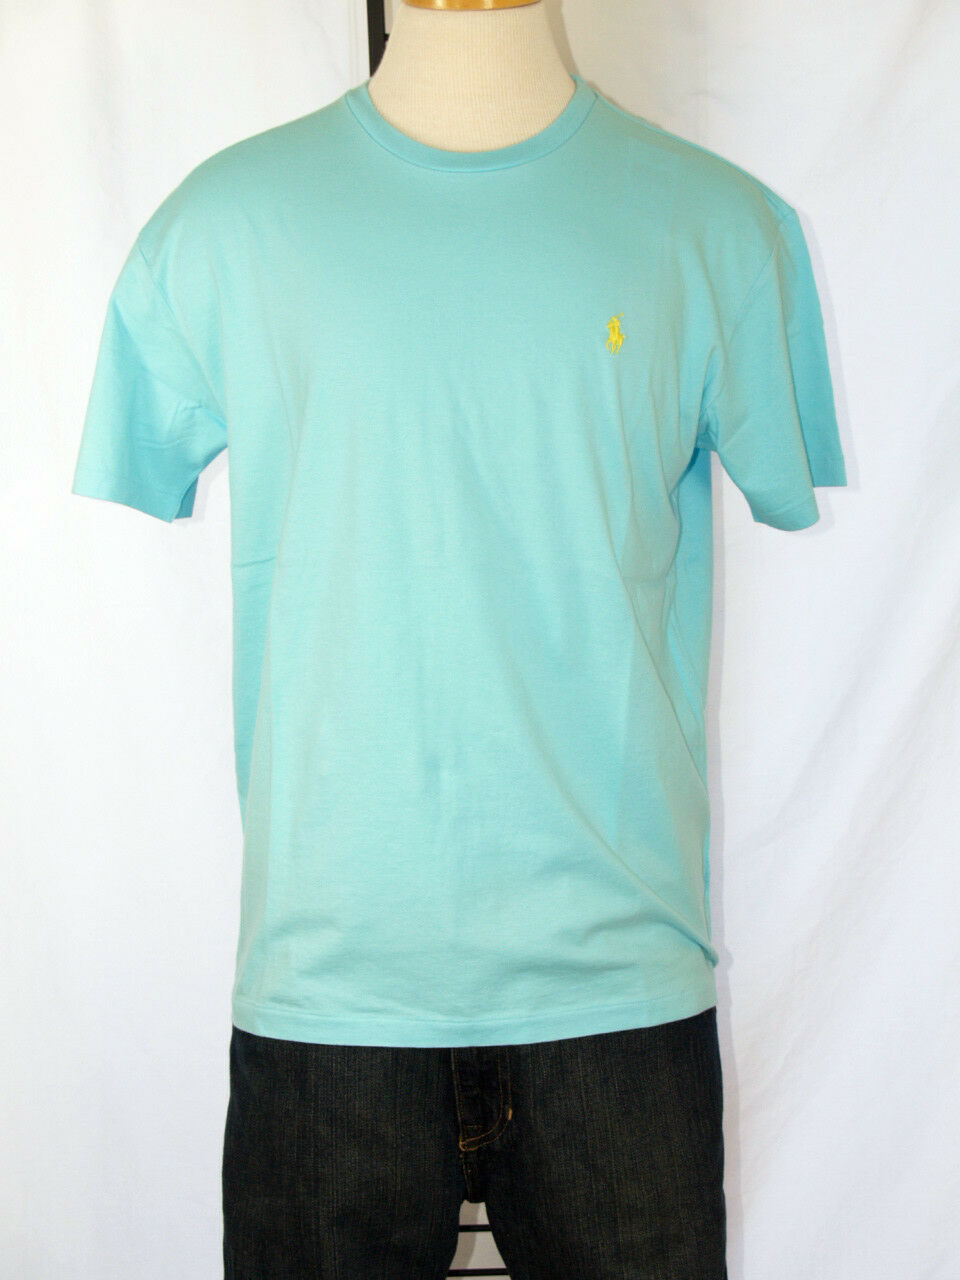 Polo Ralph Lauren Aqua T-Shirt Polo Pony 100% Cotton  XXL NWT